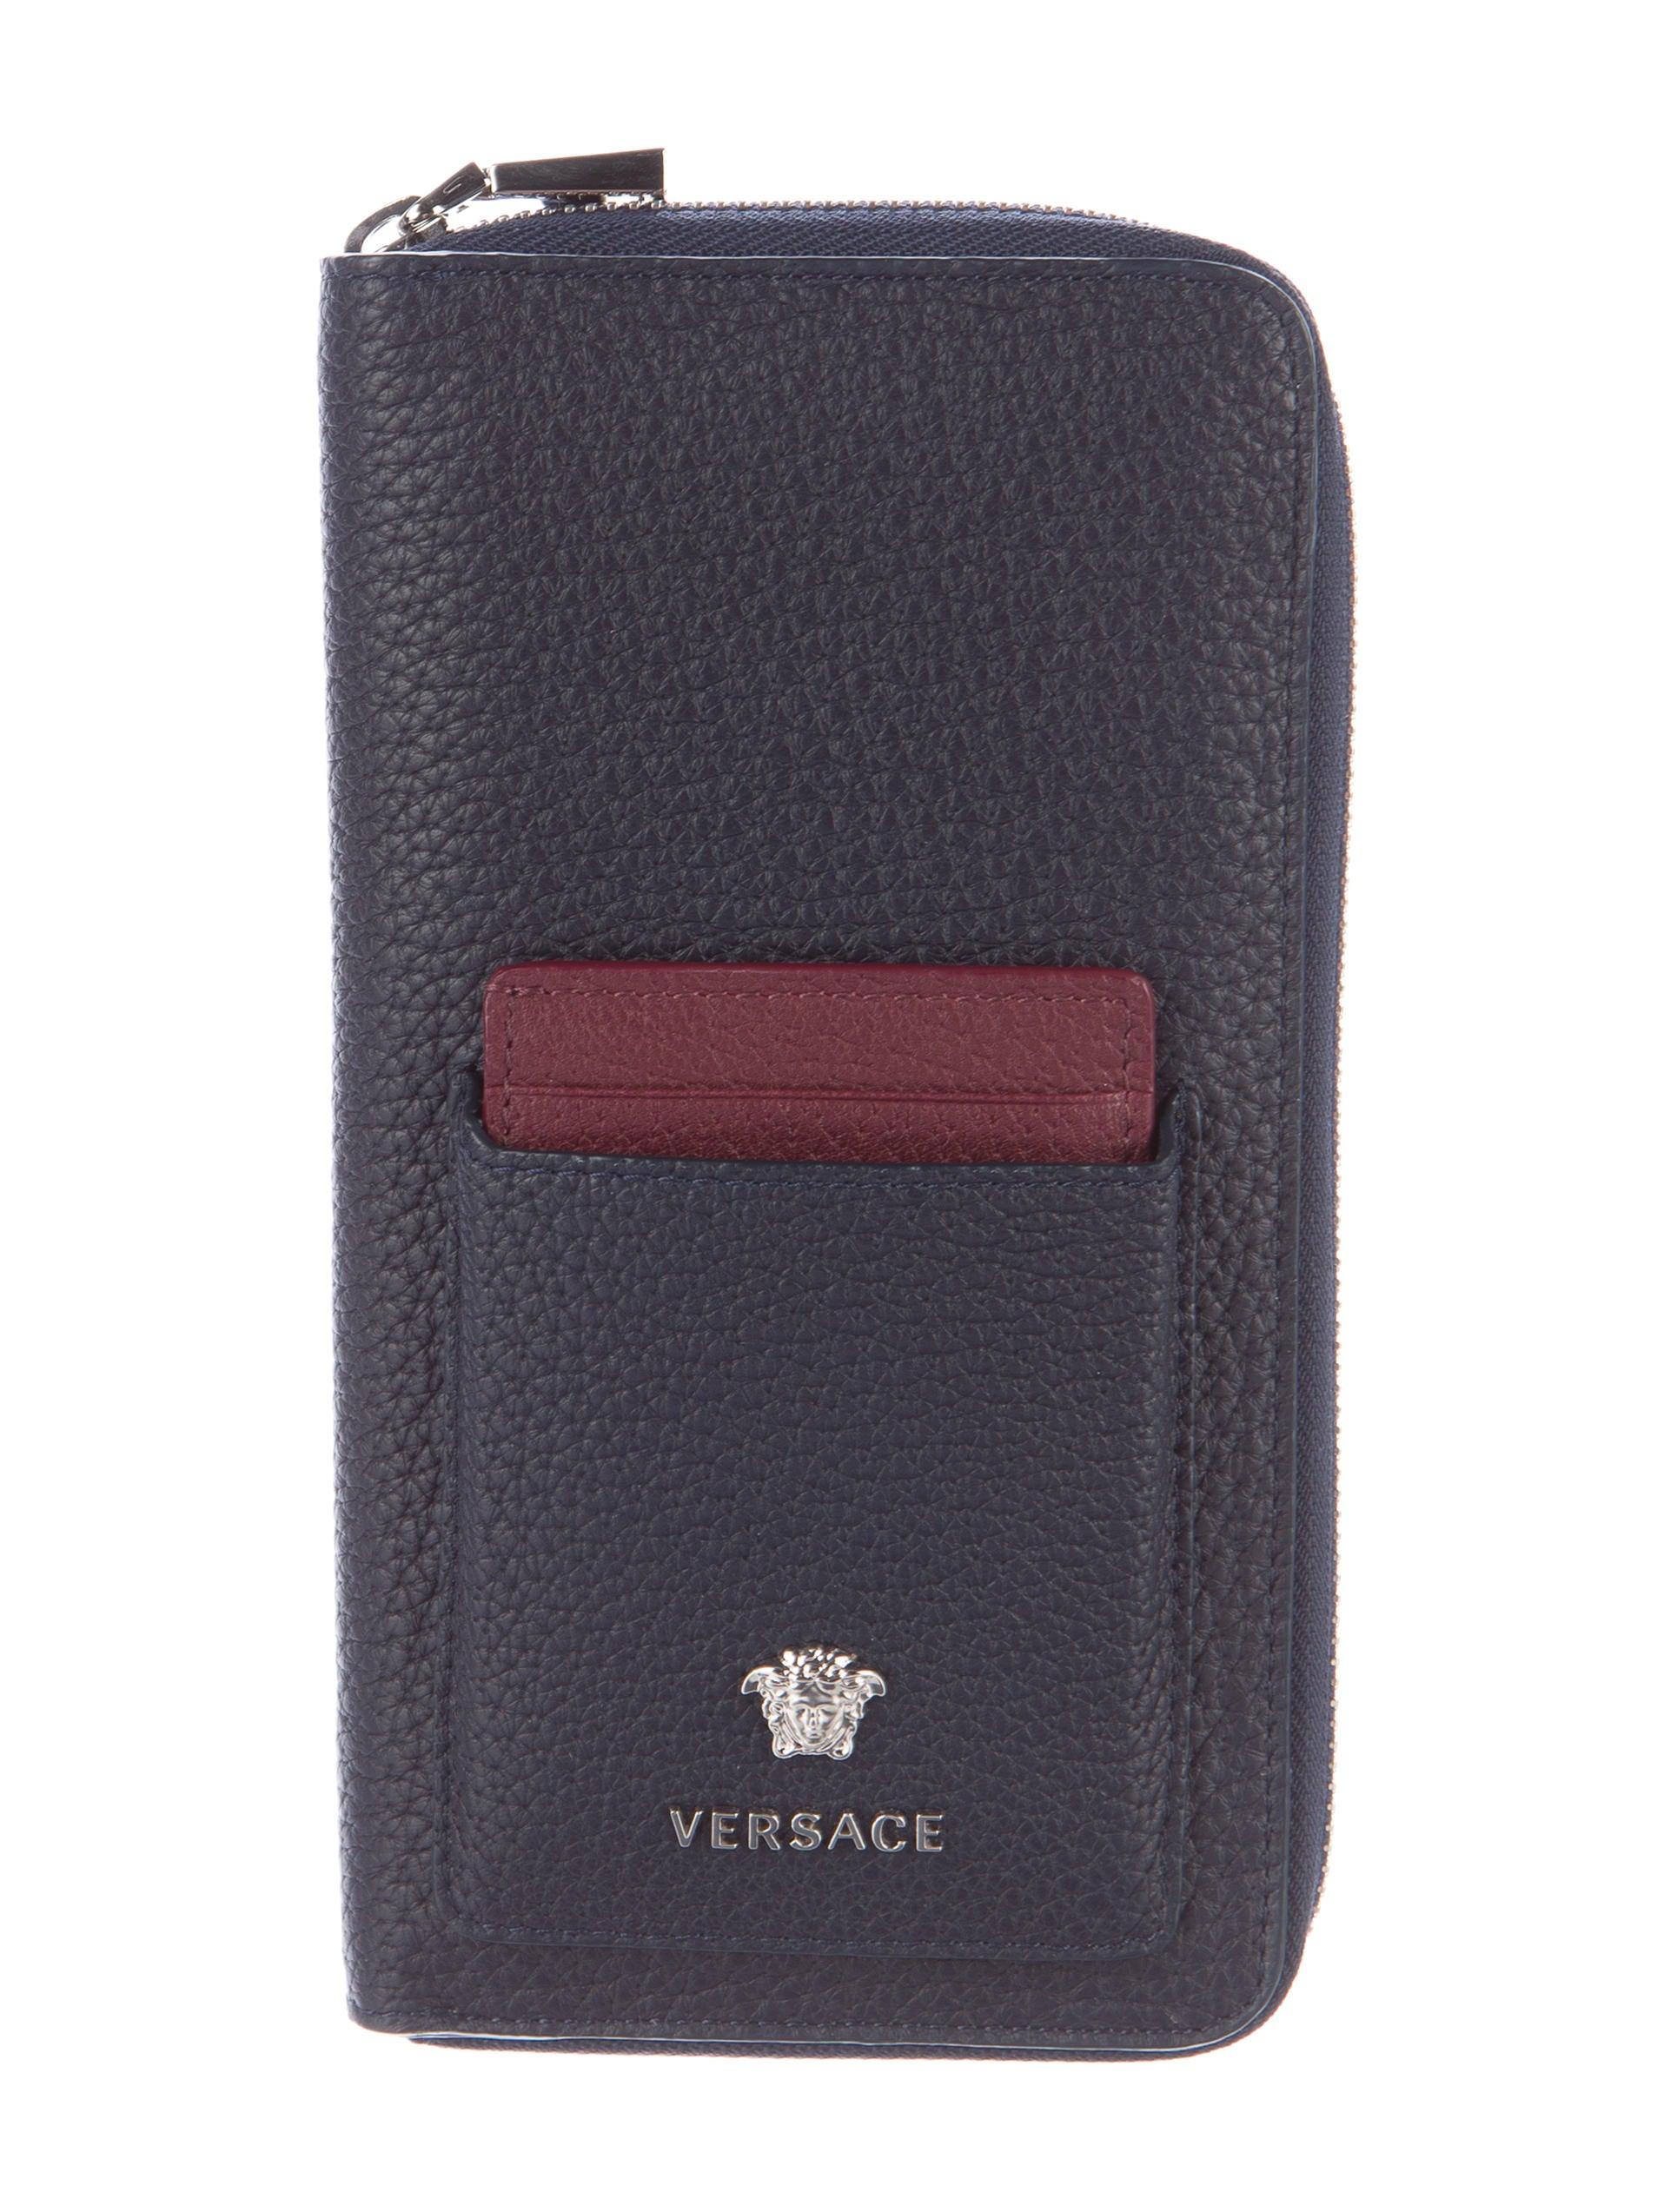 Versace continental travel wallet accessories ves28705 the continental travel wallet colourmoves Images